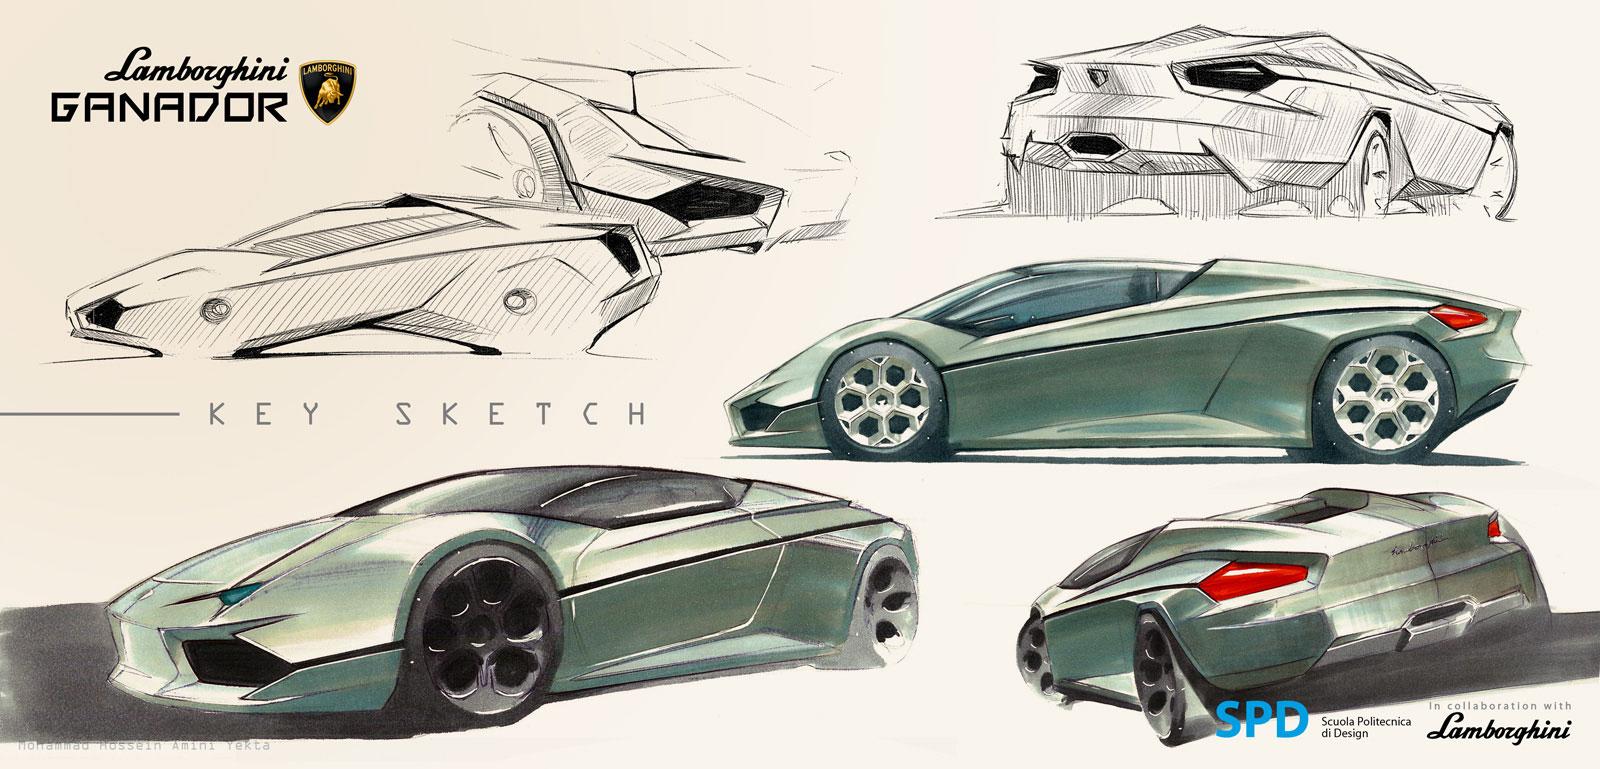 Lamborghini Ganador Concept Design Sketch on Volvo S60 Sketch